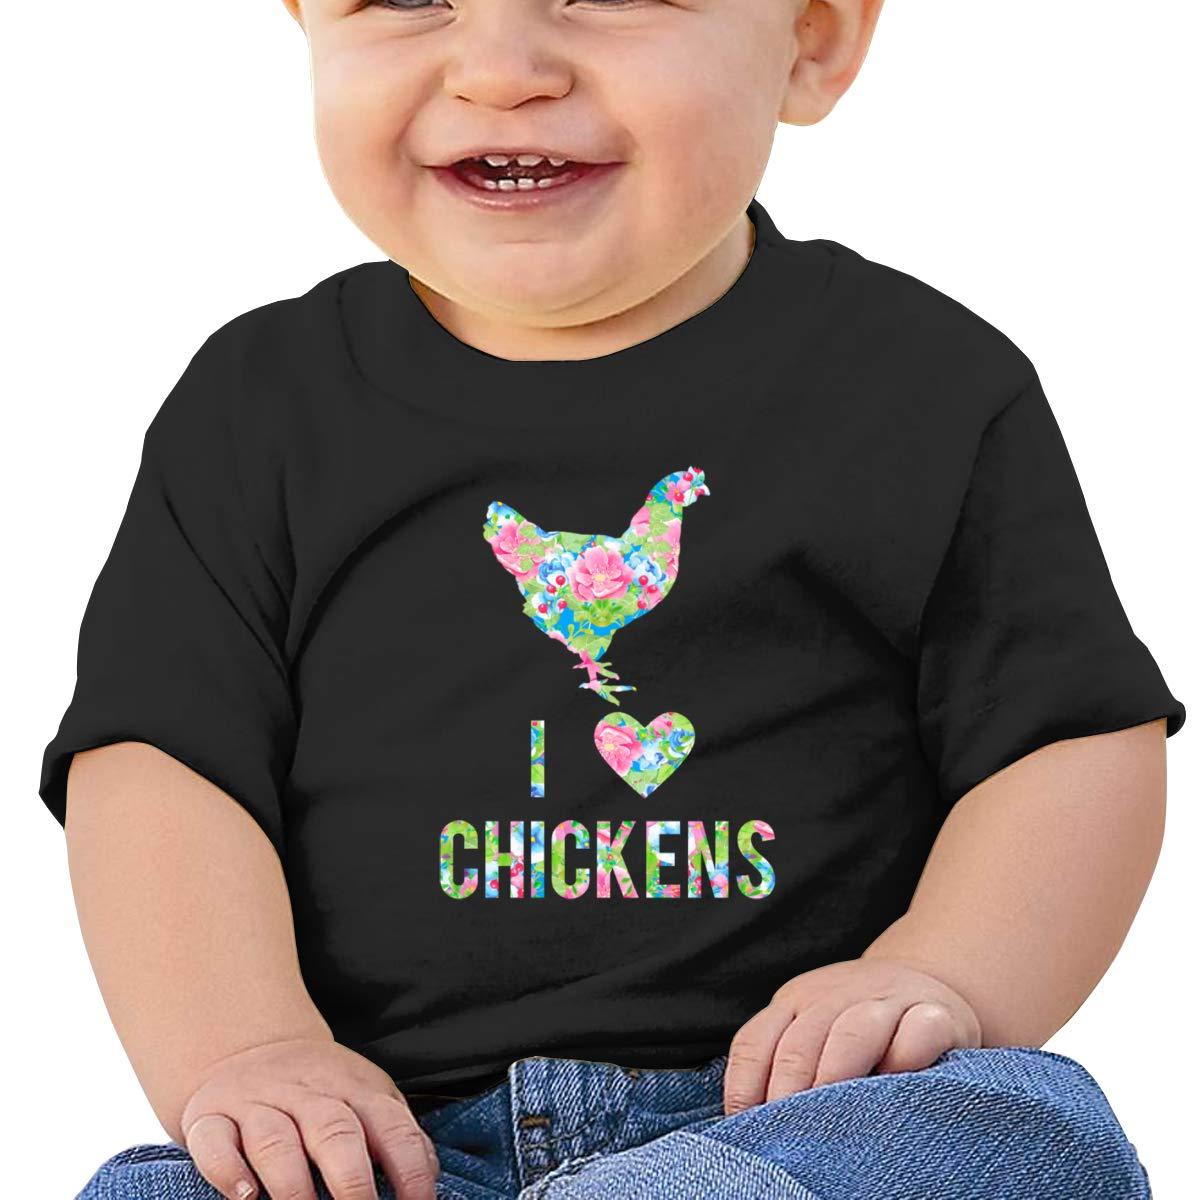 I Love Chickens 3 Toddler Short Sleeve Top Boys Birthday Gift